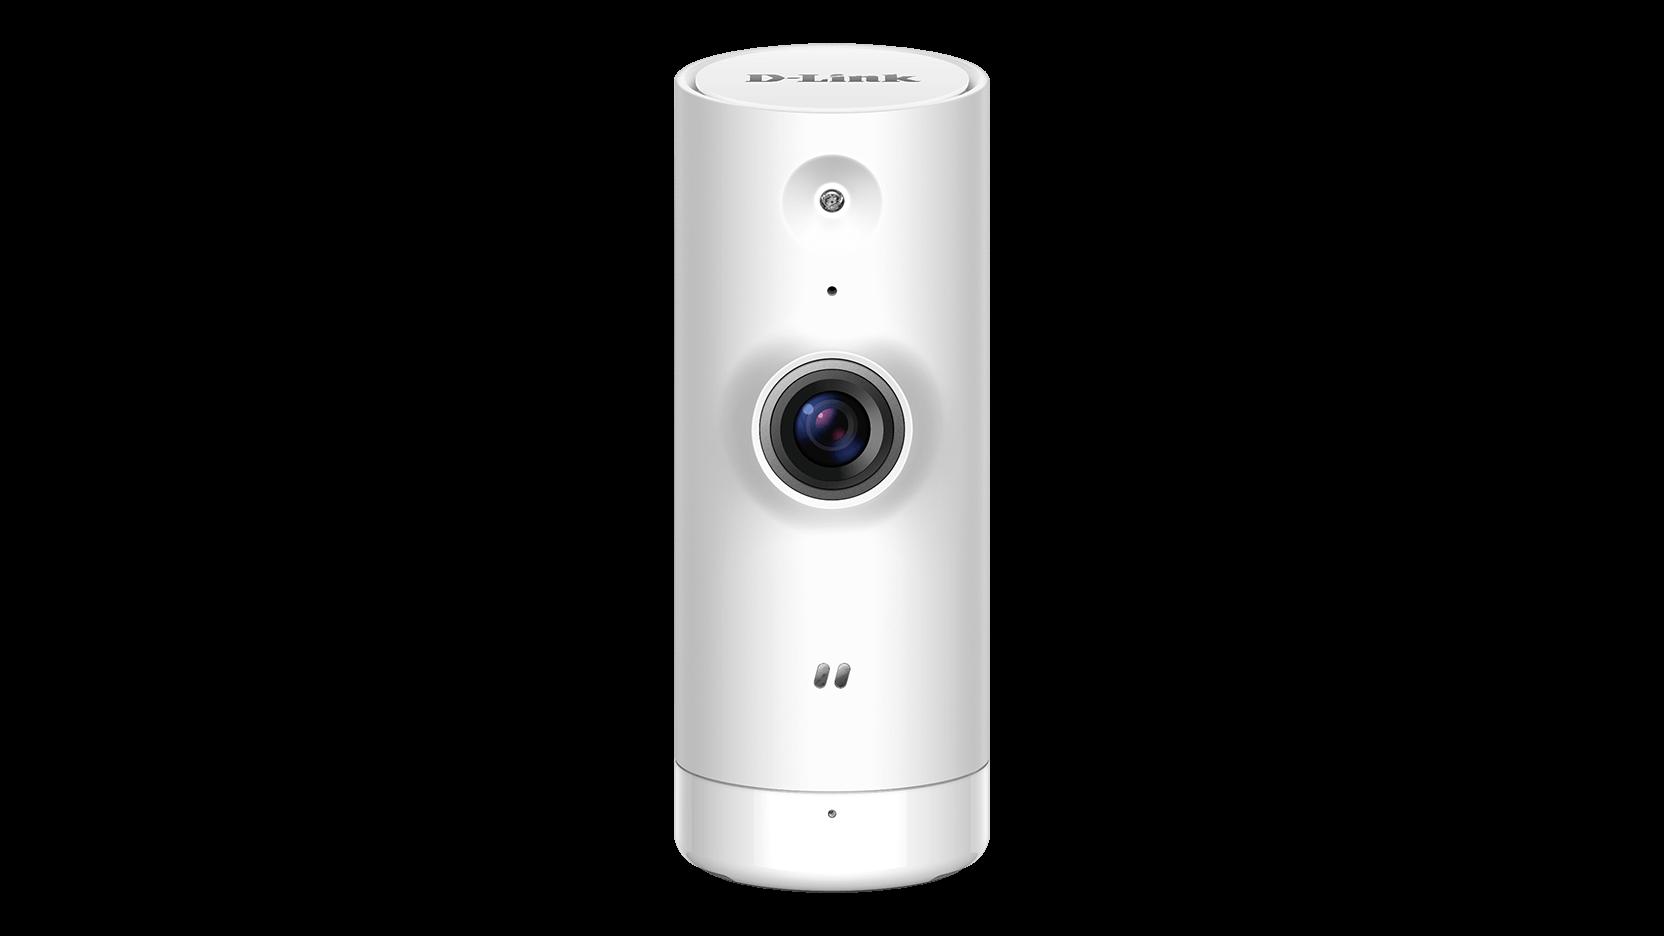 DCS-8000LH Mini HD WiFi Camera | D-Link UK